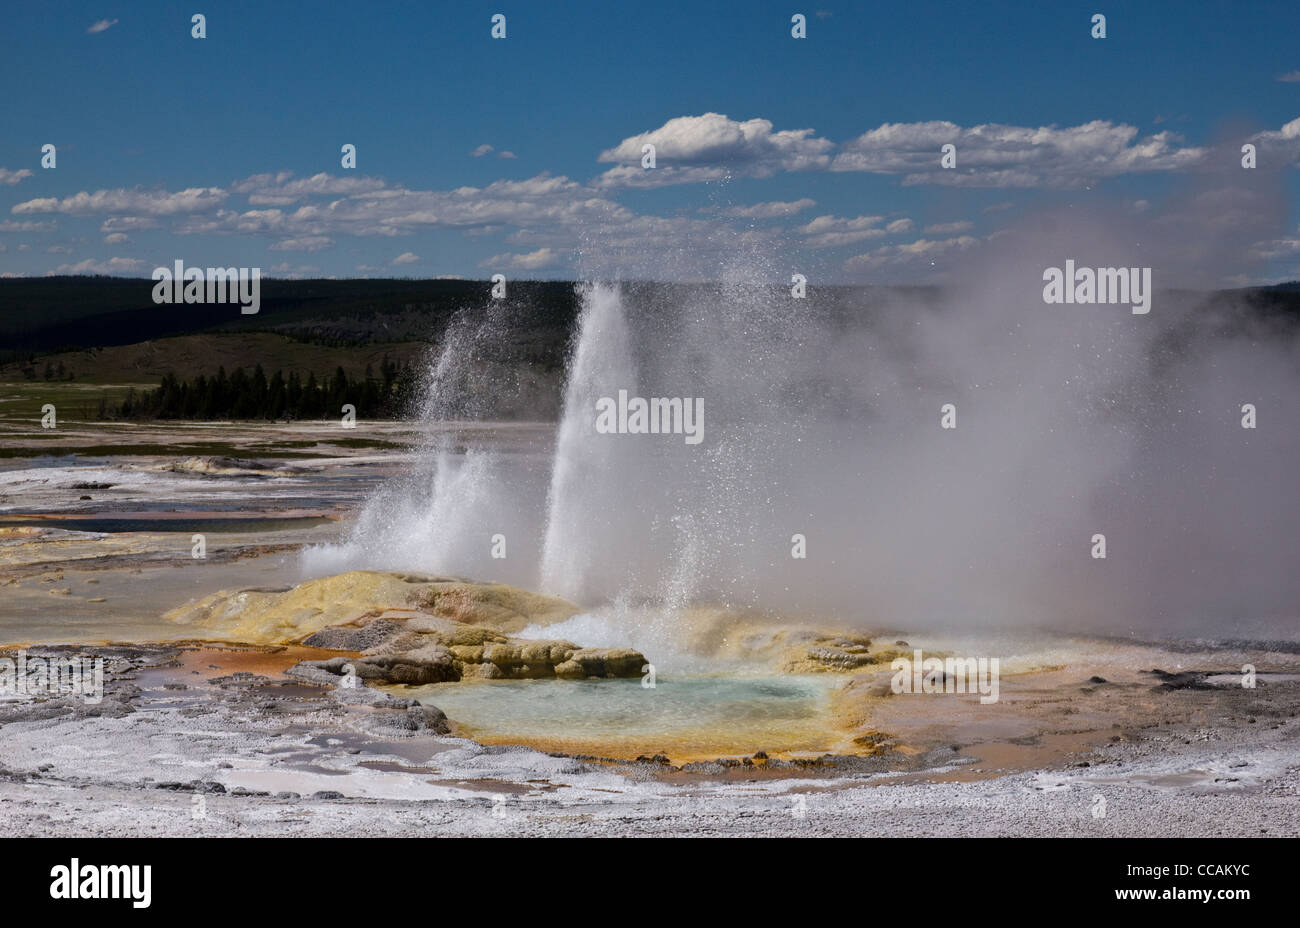 Clepsydra Geyser found in the lower geyser basin in Yellowstone National Park. Stock Photo